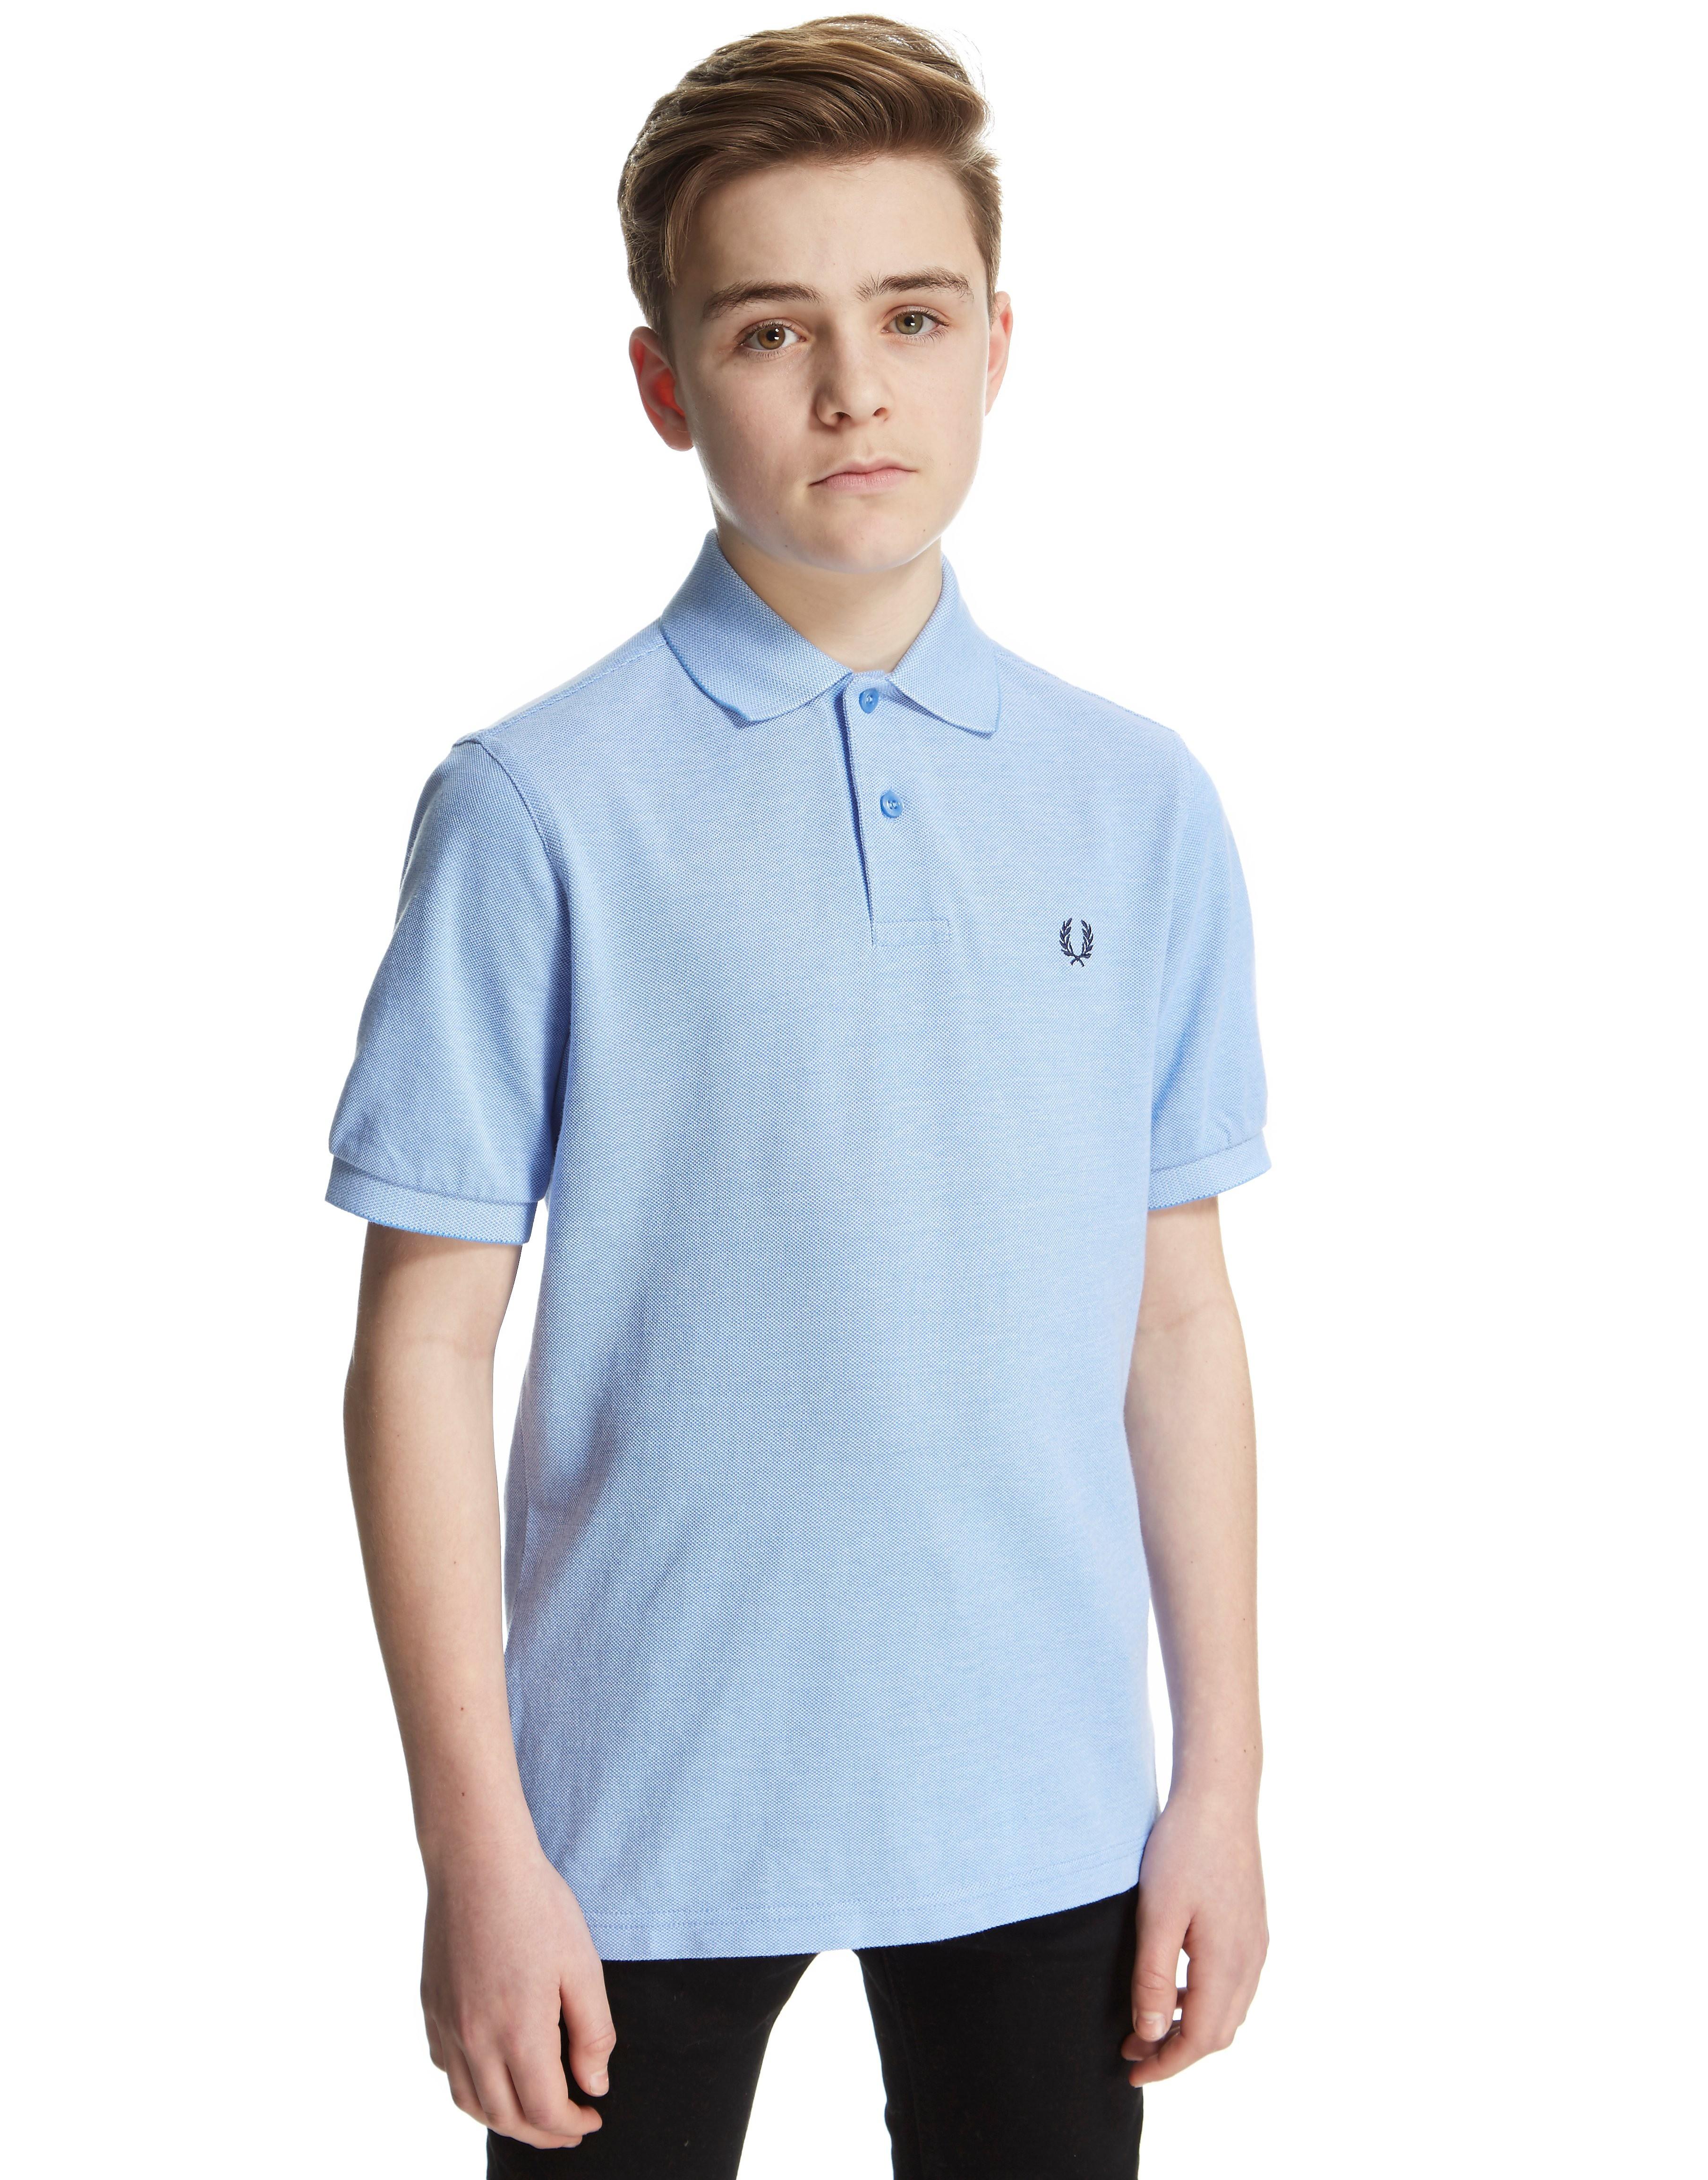 Fred Perry Plain Polo Shirt Junior